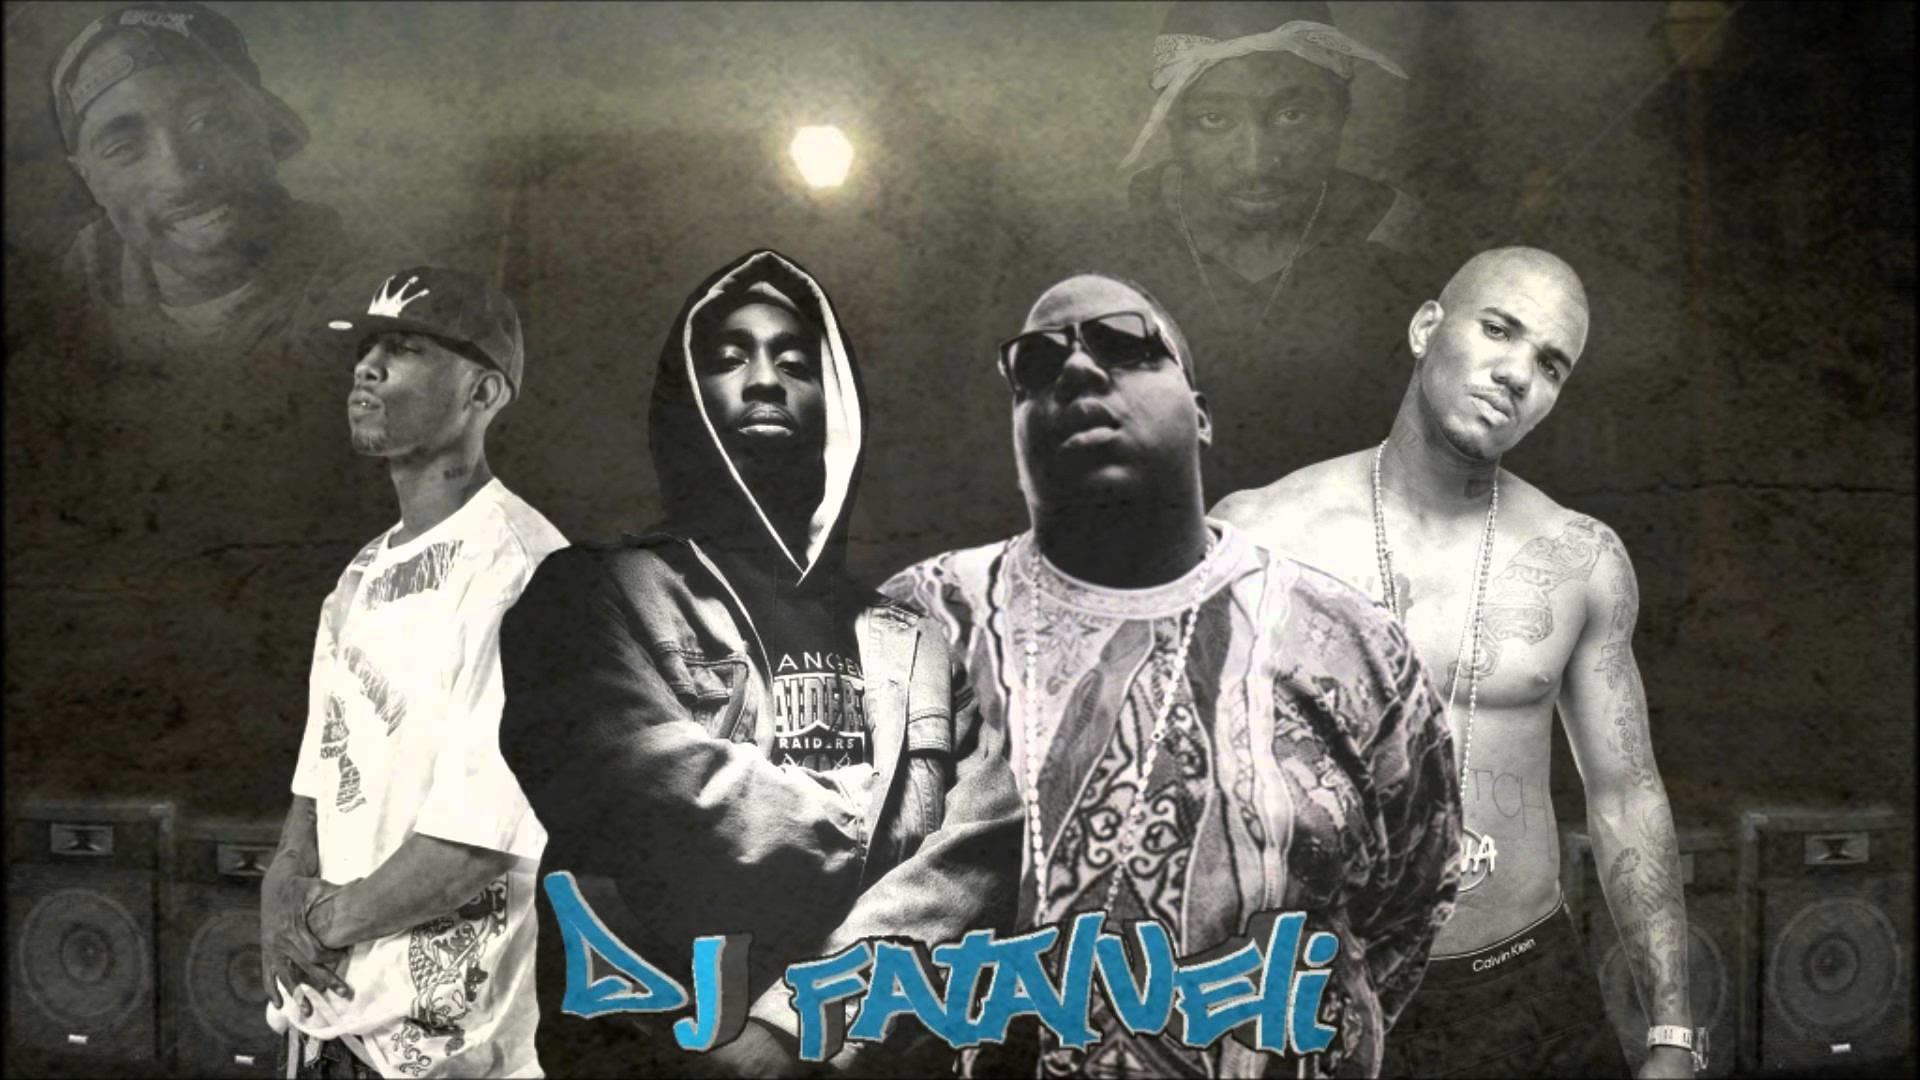 2Pac Ft. Biggie Smalls, Eazy E & Big Pun – The Streets (DJ